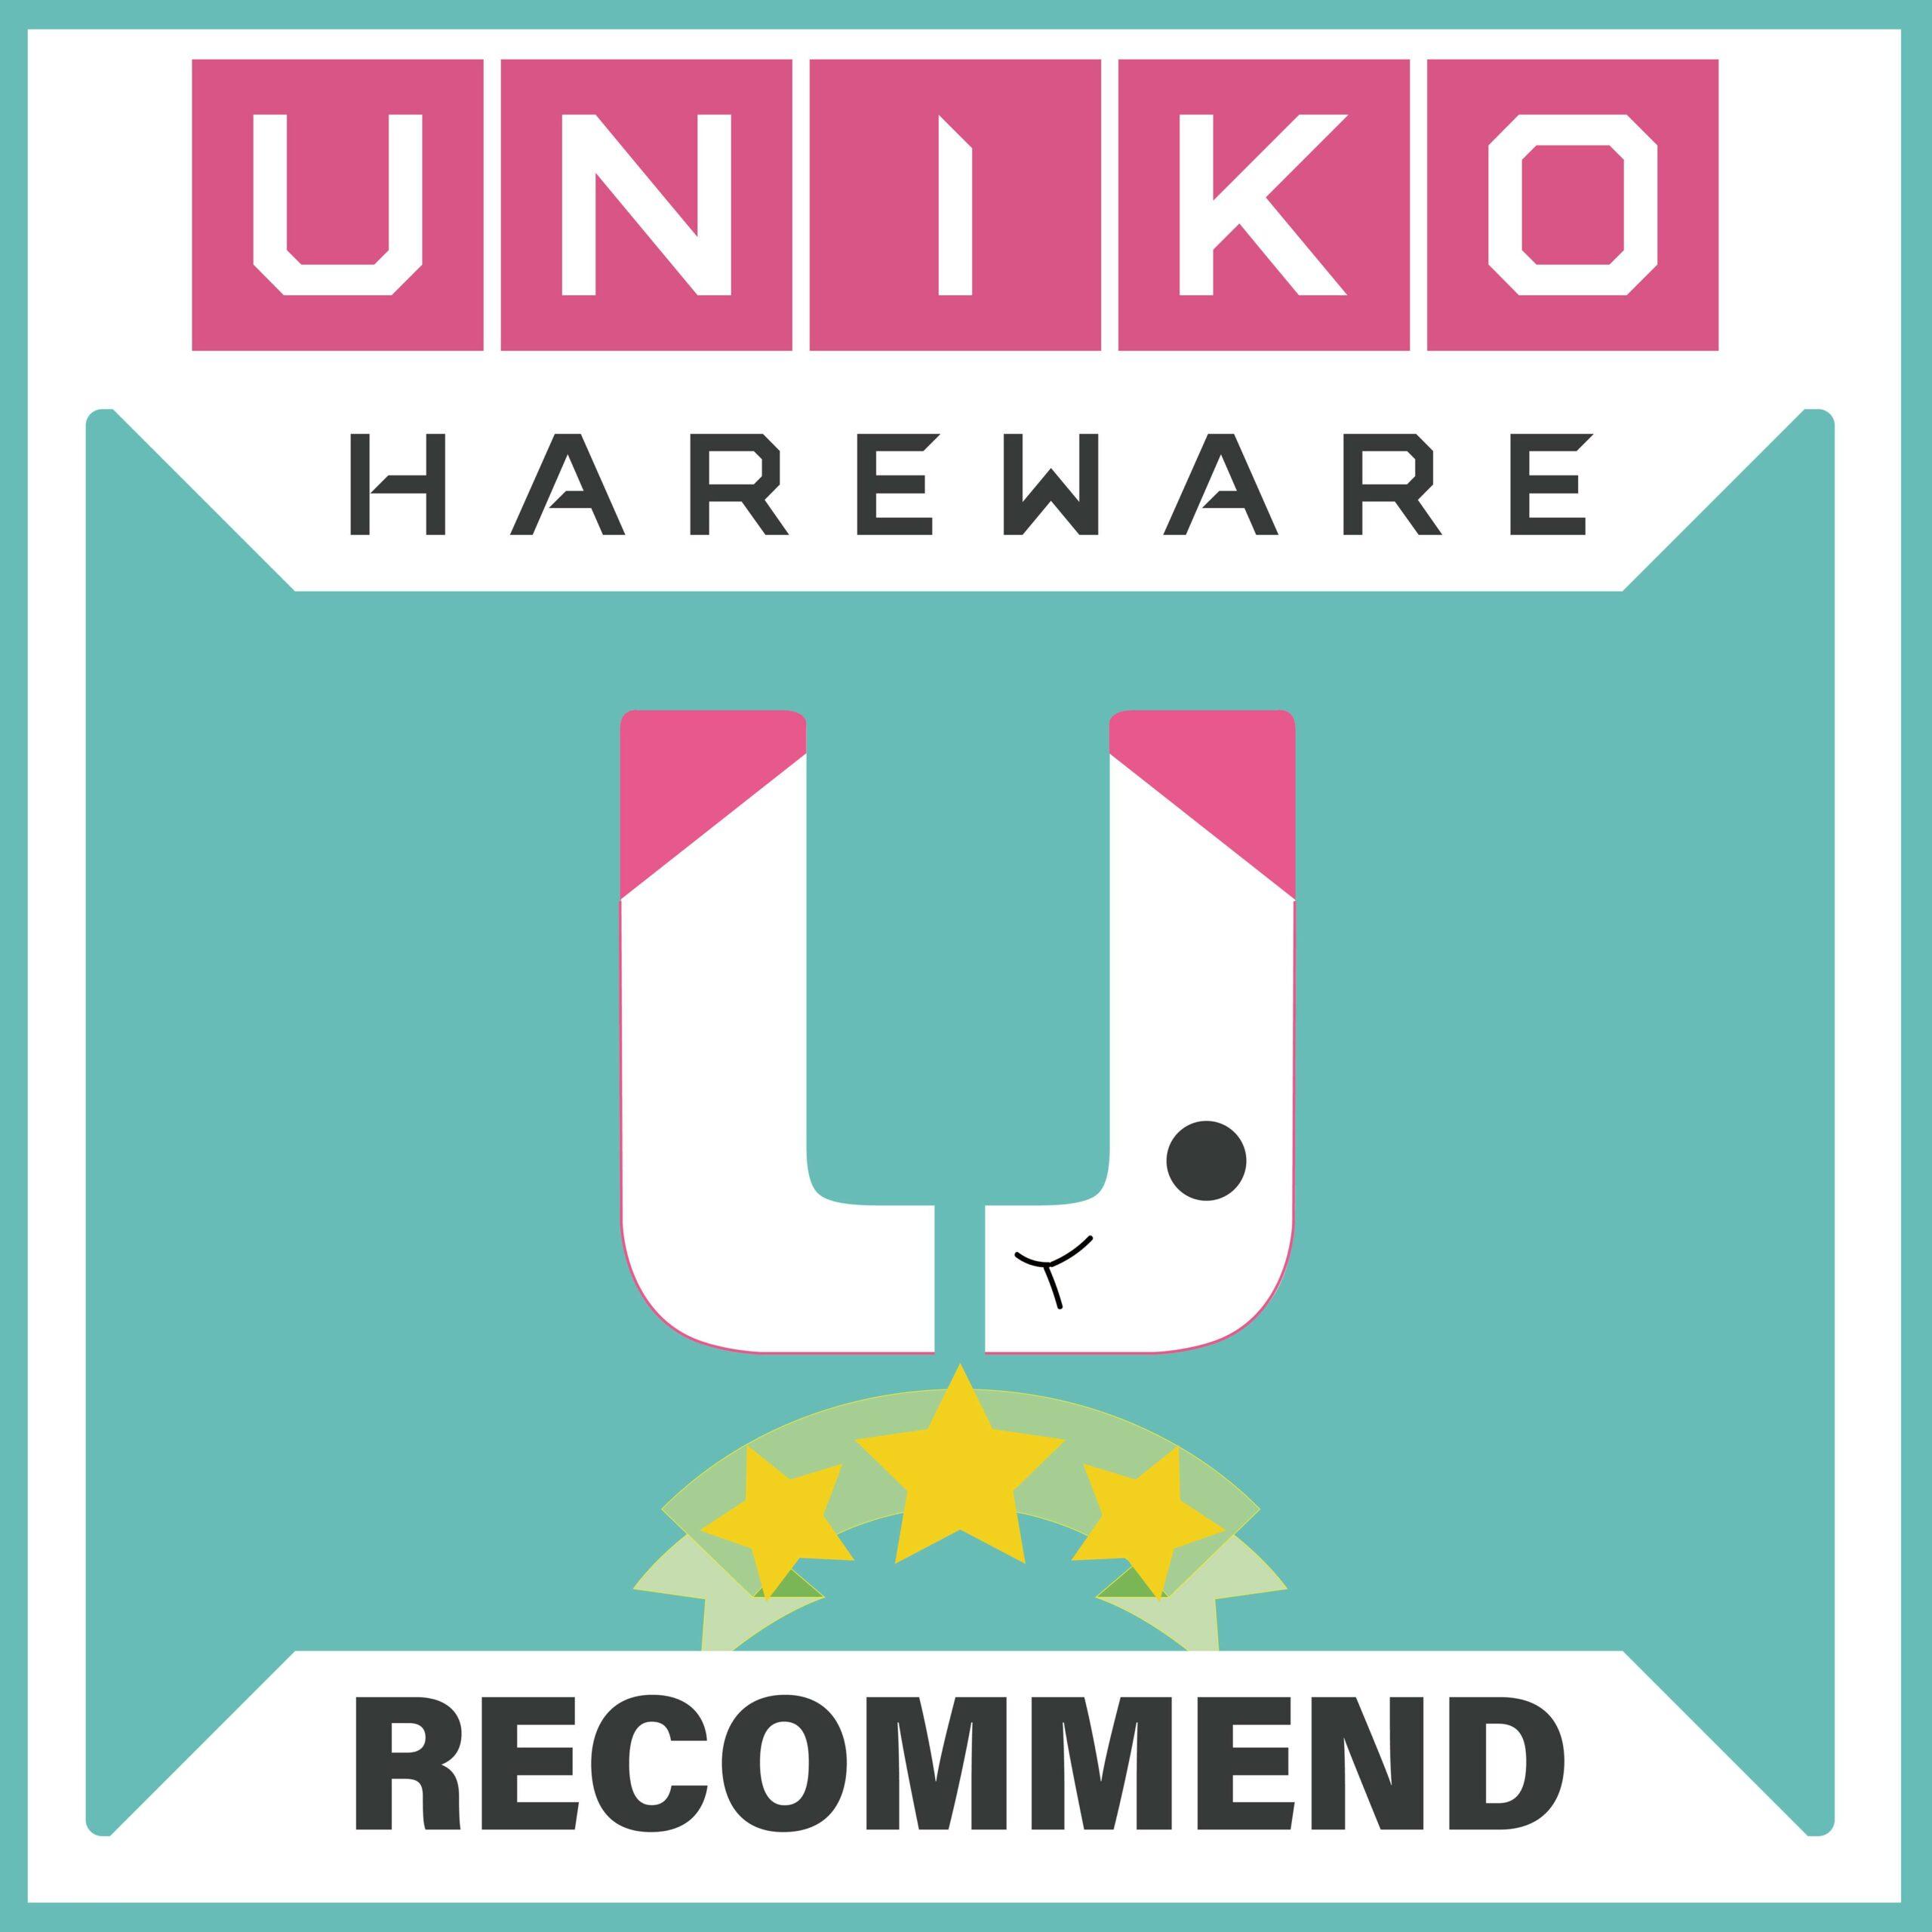 UNIKO's Hardware 推薦購買 Antec DP502 FLUX